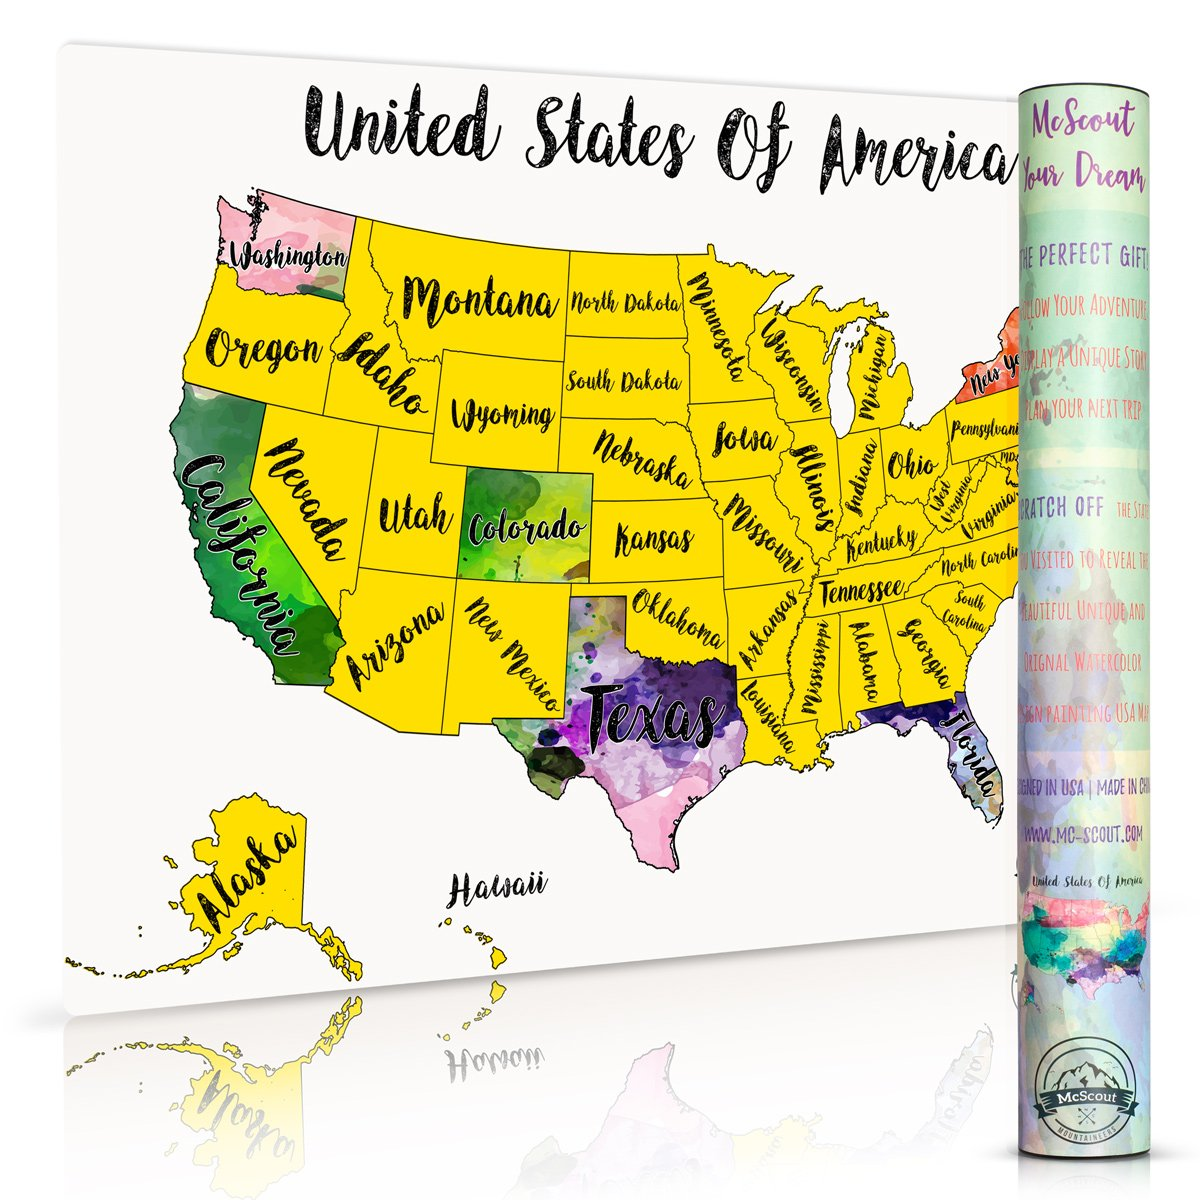 HttpsimagesnasslimagesamazoncomimagesI - Kansas map usa